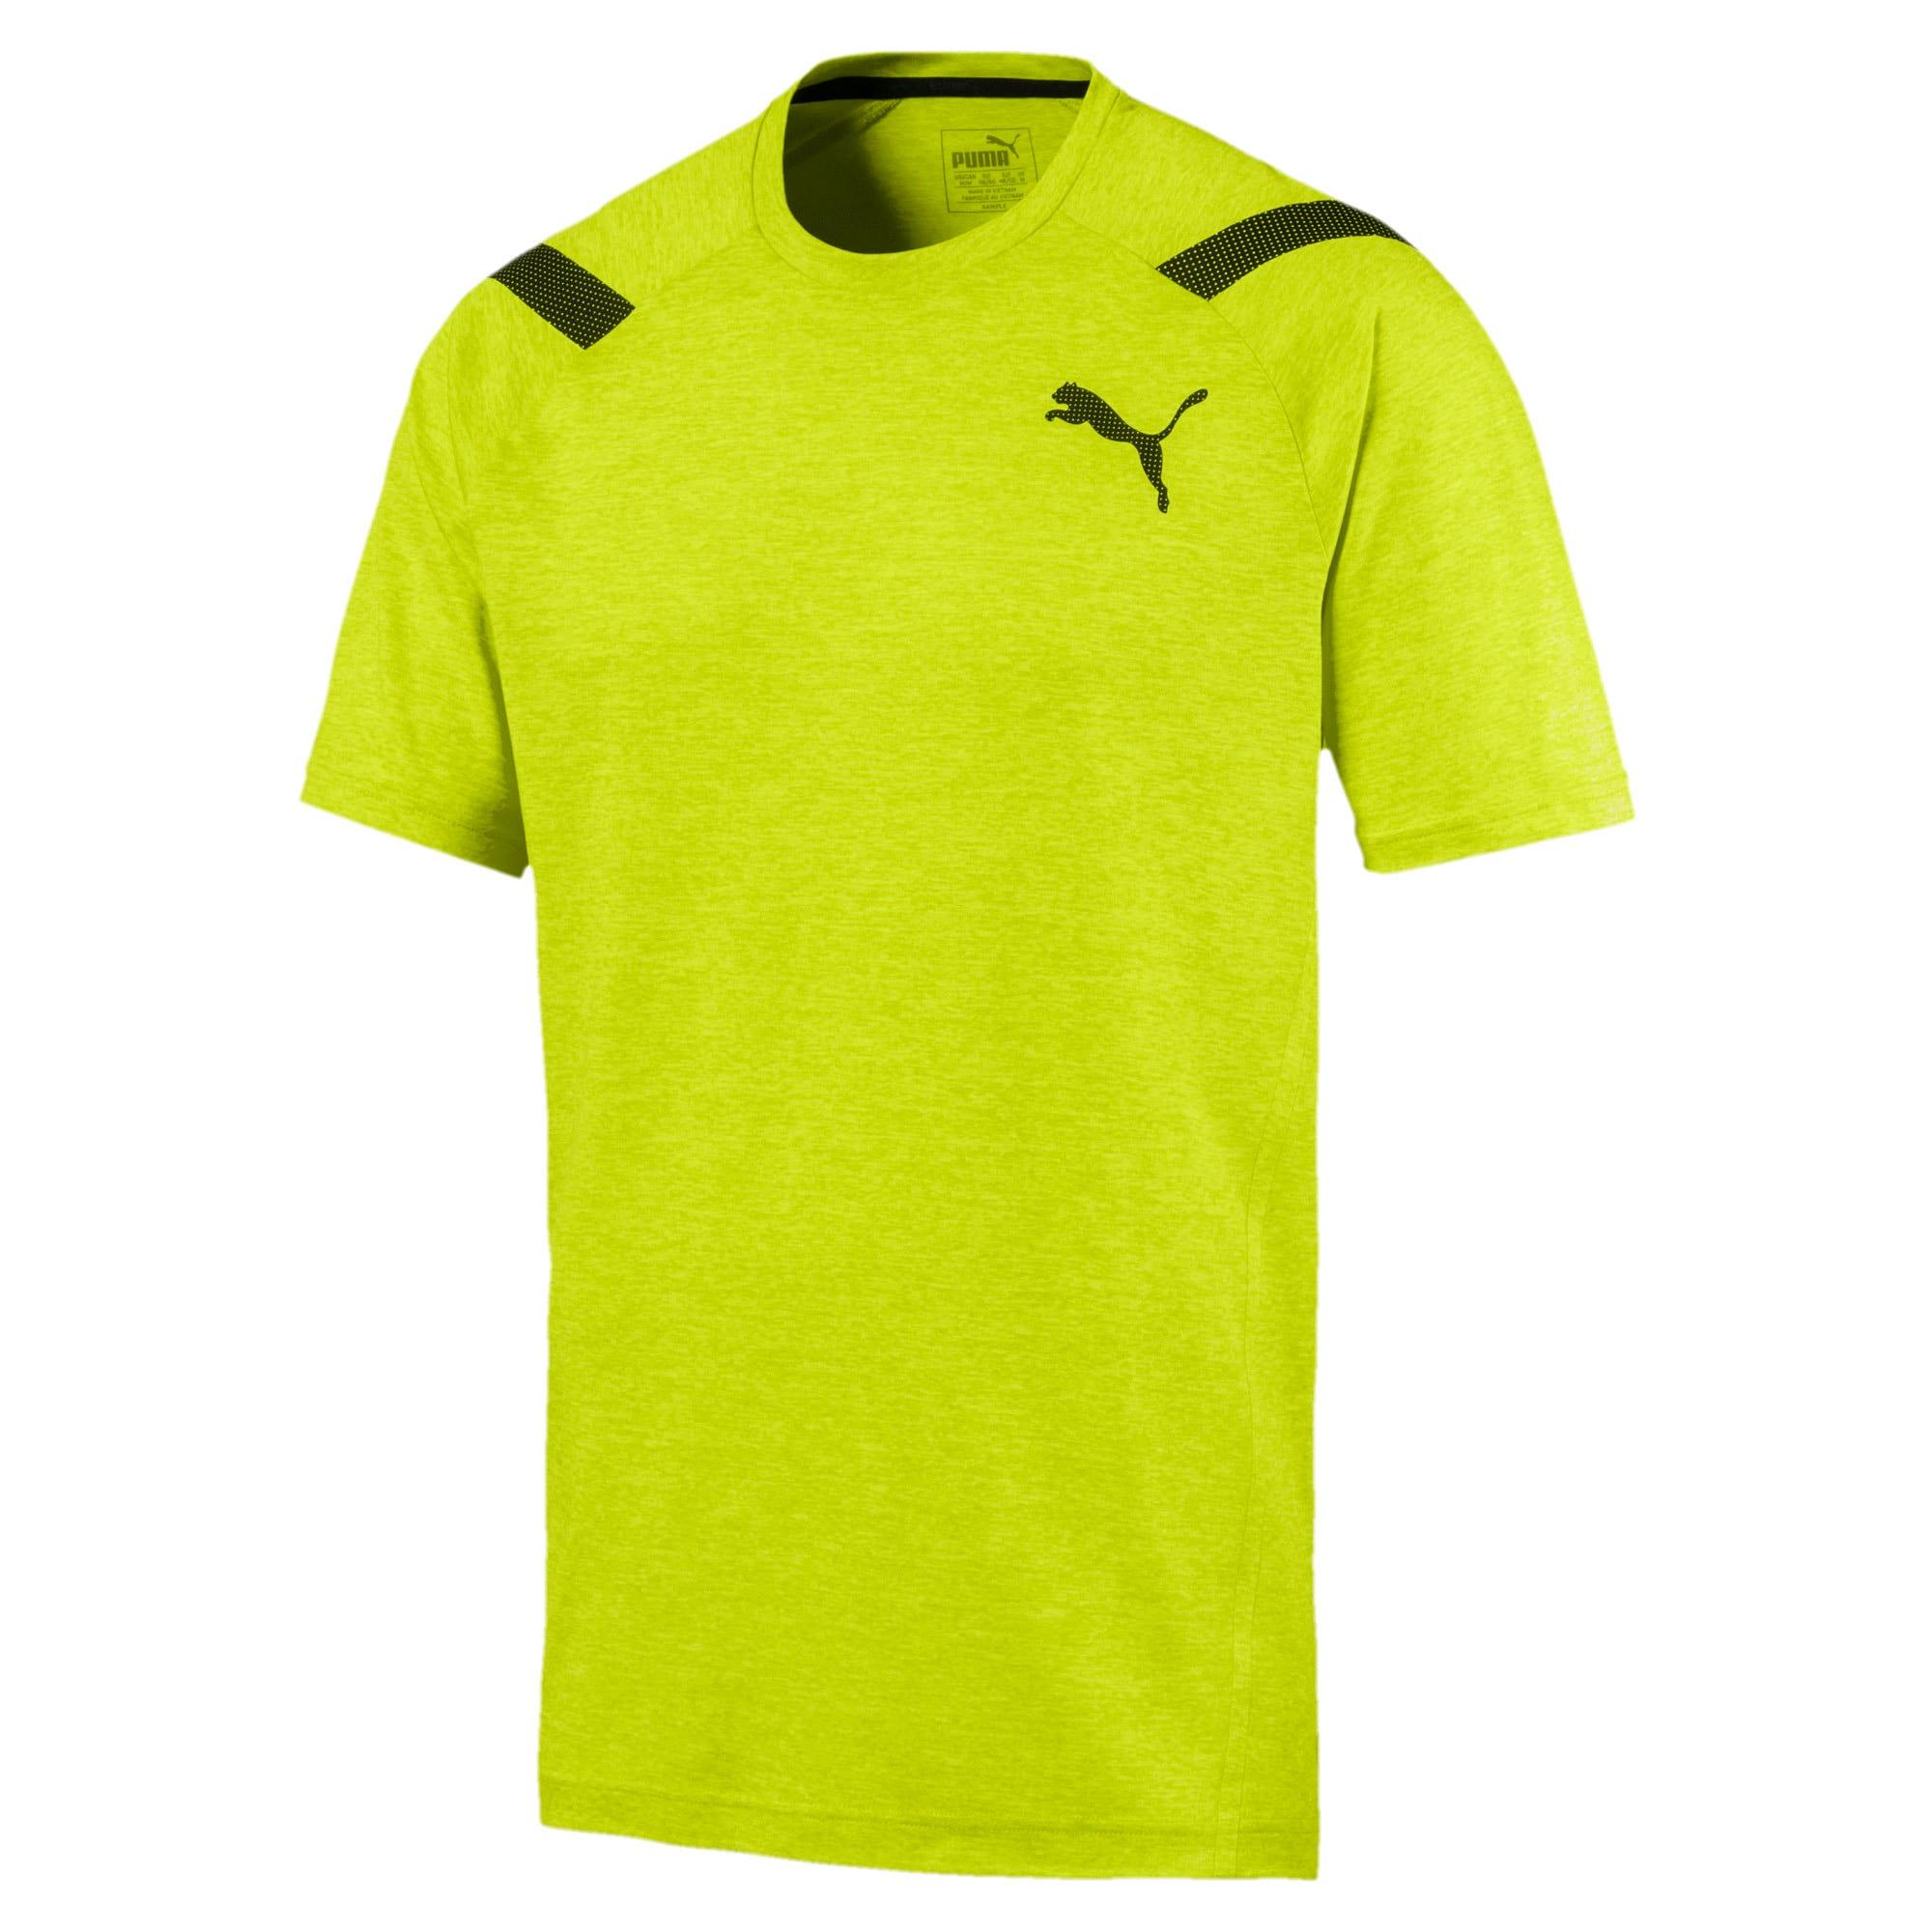 Thumbnail 1 of Active Training Men's Bonded Tech T-Shirt, Nrgy Yellow Heather, medium-IND